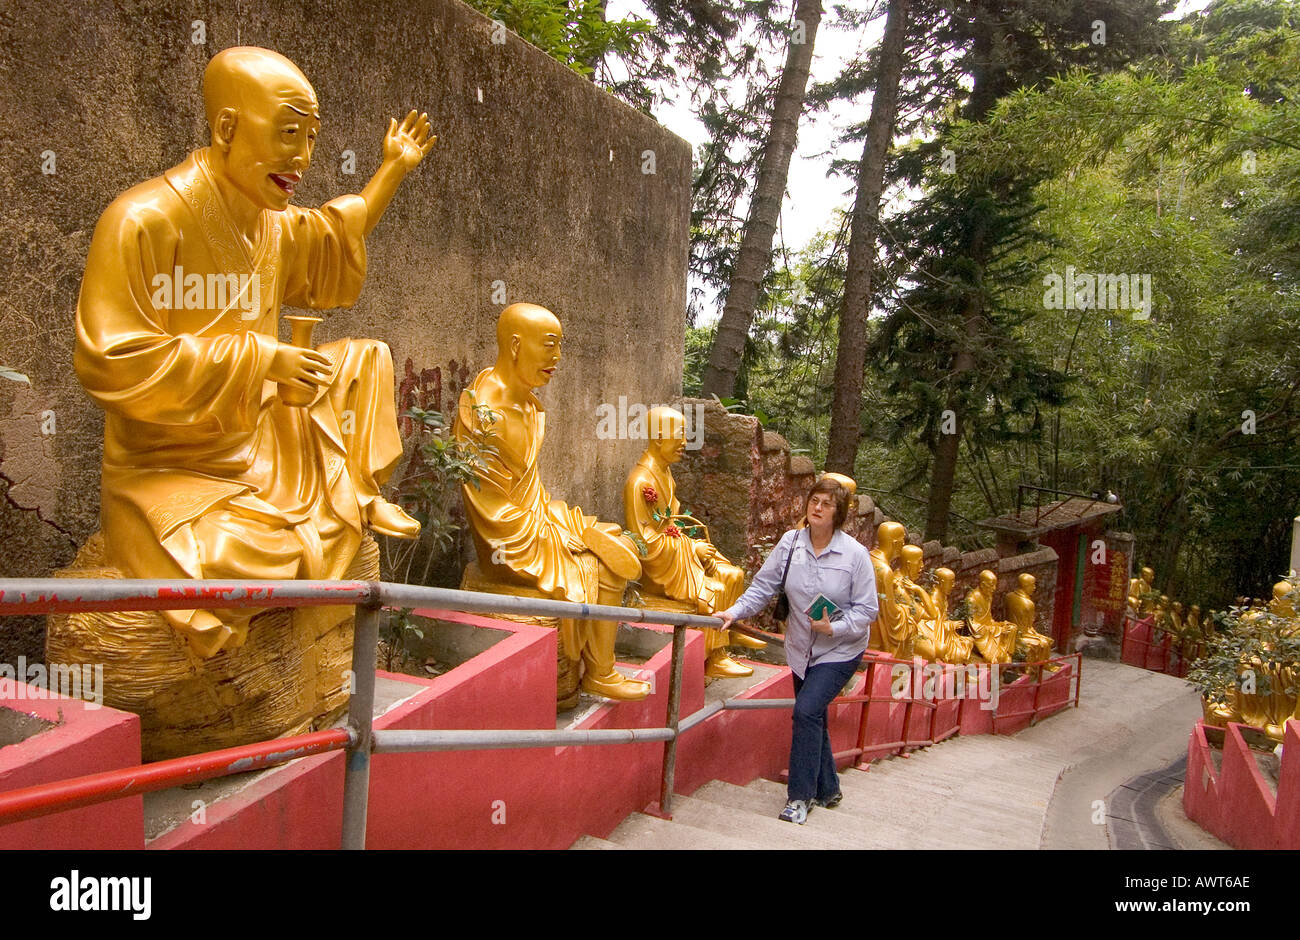 dh Ten Thousand Buddhas Monastery SHATIN HONG KONG Woman tourist walking up steps Golden Buddha statues 10000 temple Stock Photo